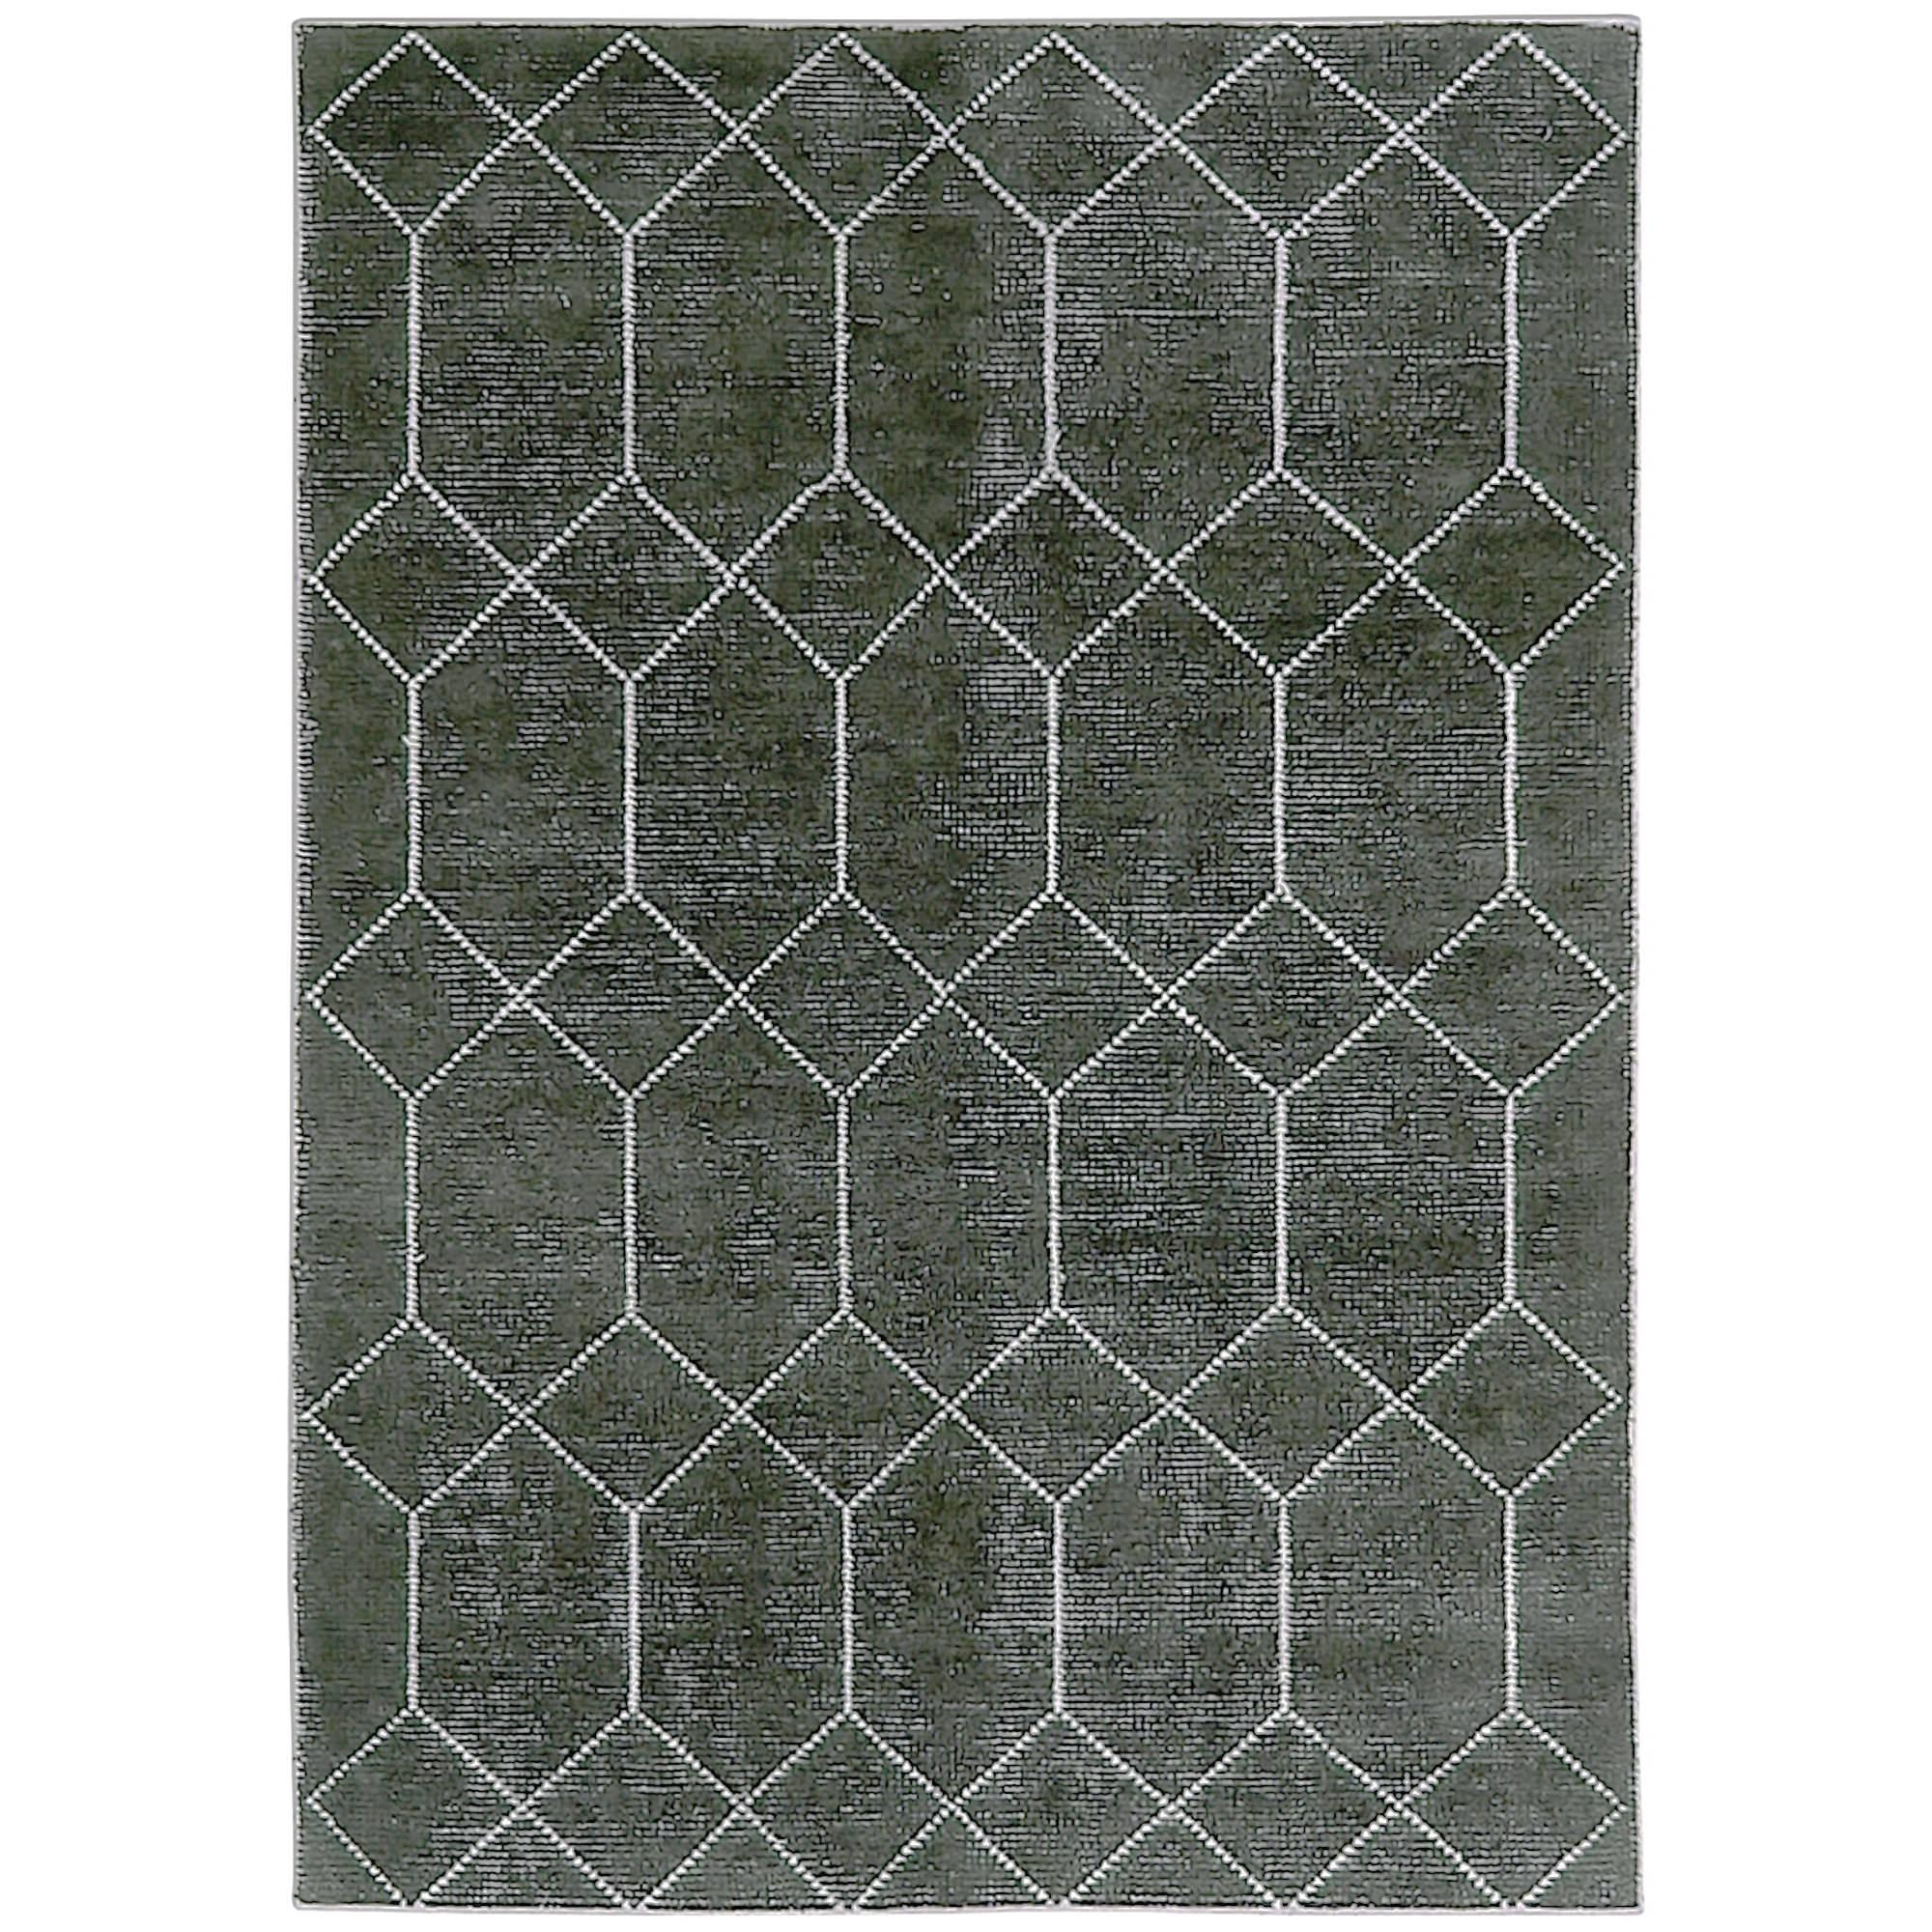 Geometrics Hand Knotted Wool Rug, 200x300cm, Black